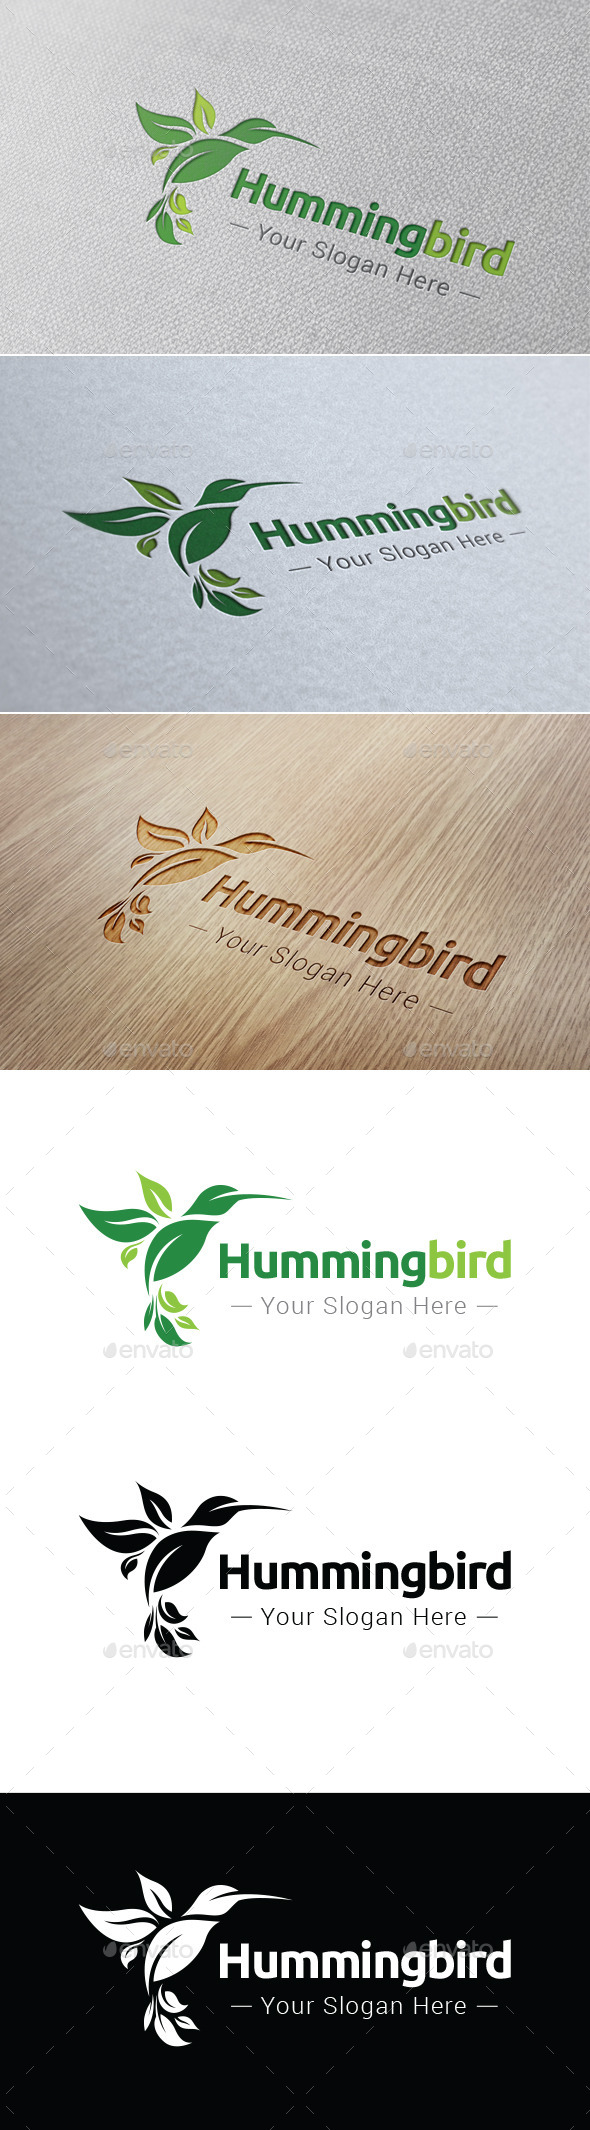 GraphicRiver Hummingbird Logo Template 9160069